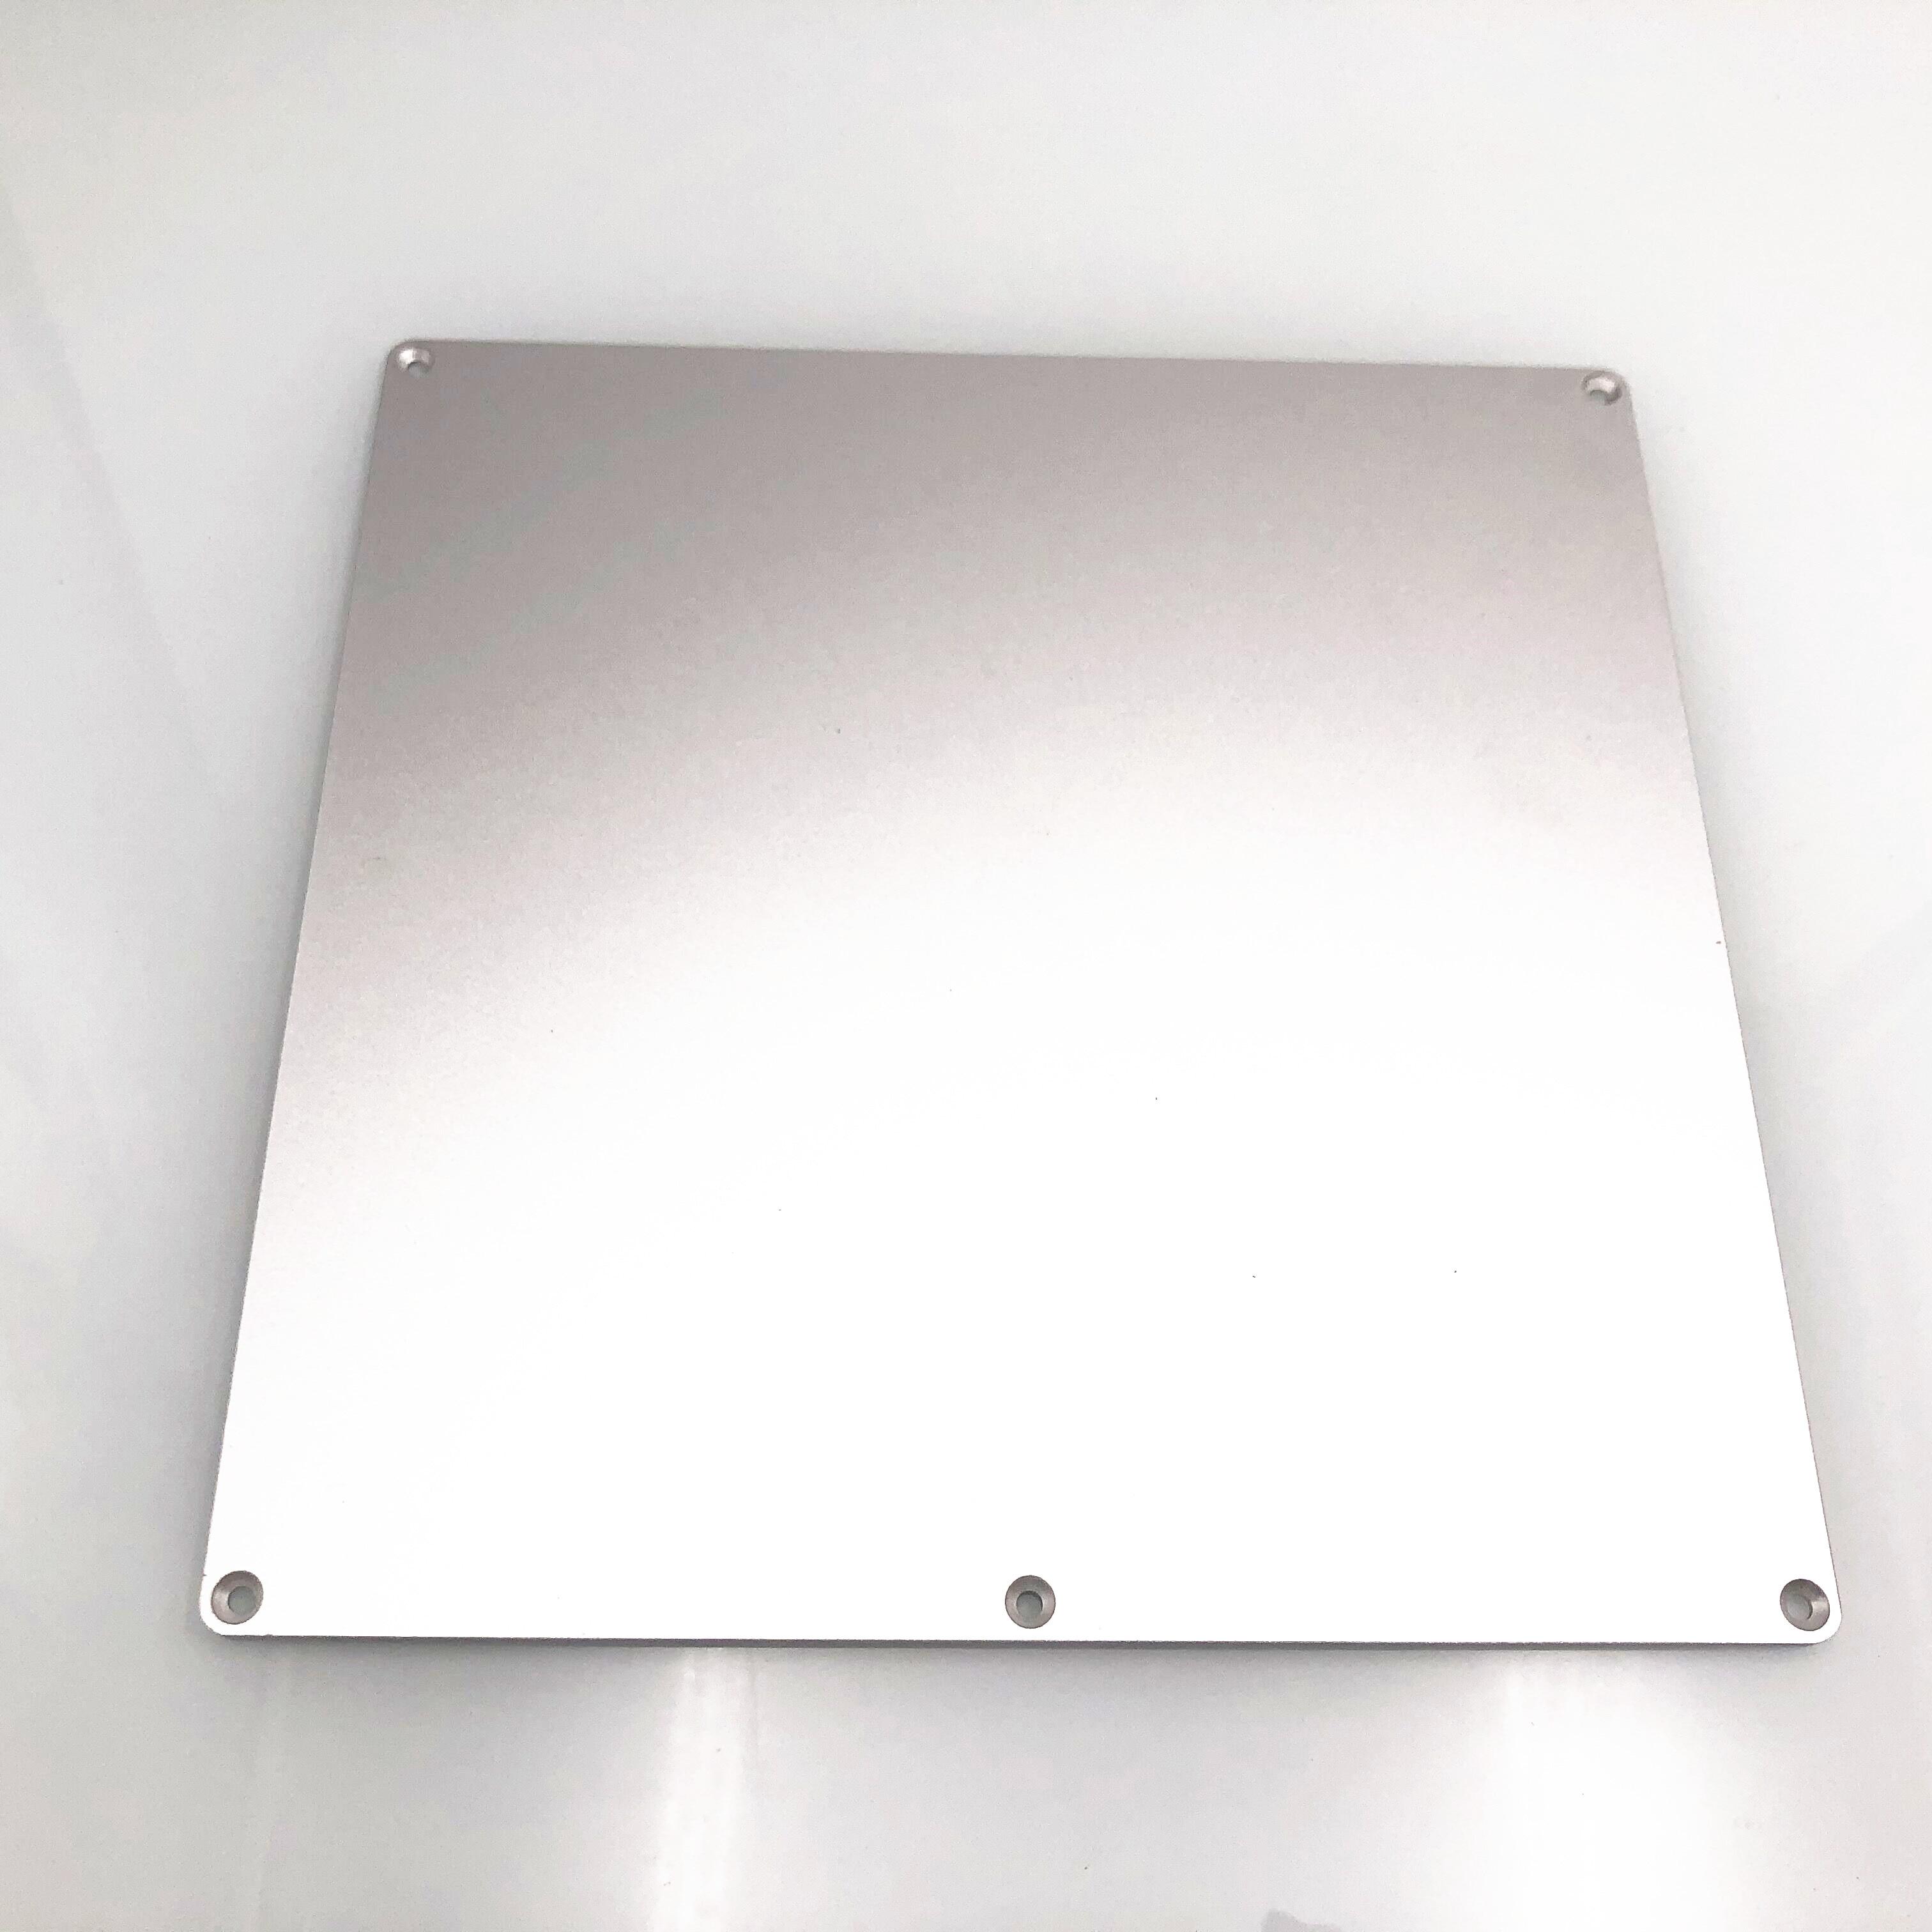 1 Uds. Placa de aluminio anodizado de actualización Y carro 3D para impresoras Creality Prusa I3 Anet A8 3D